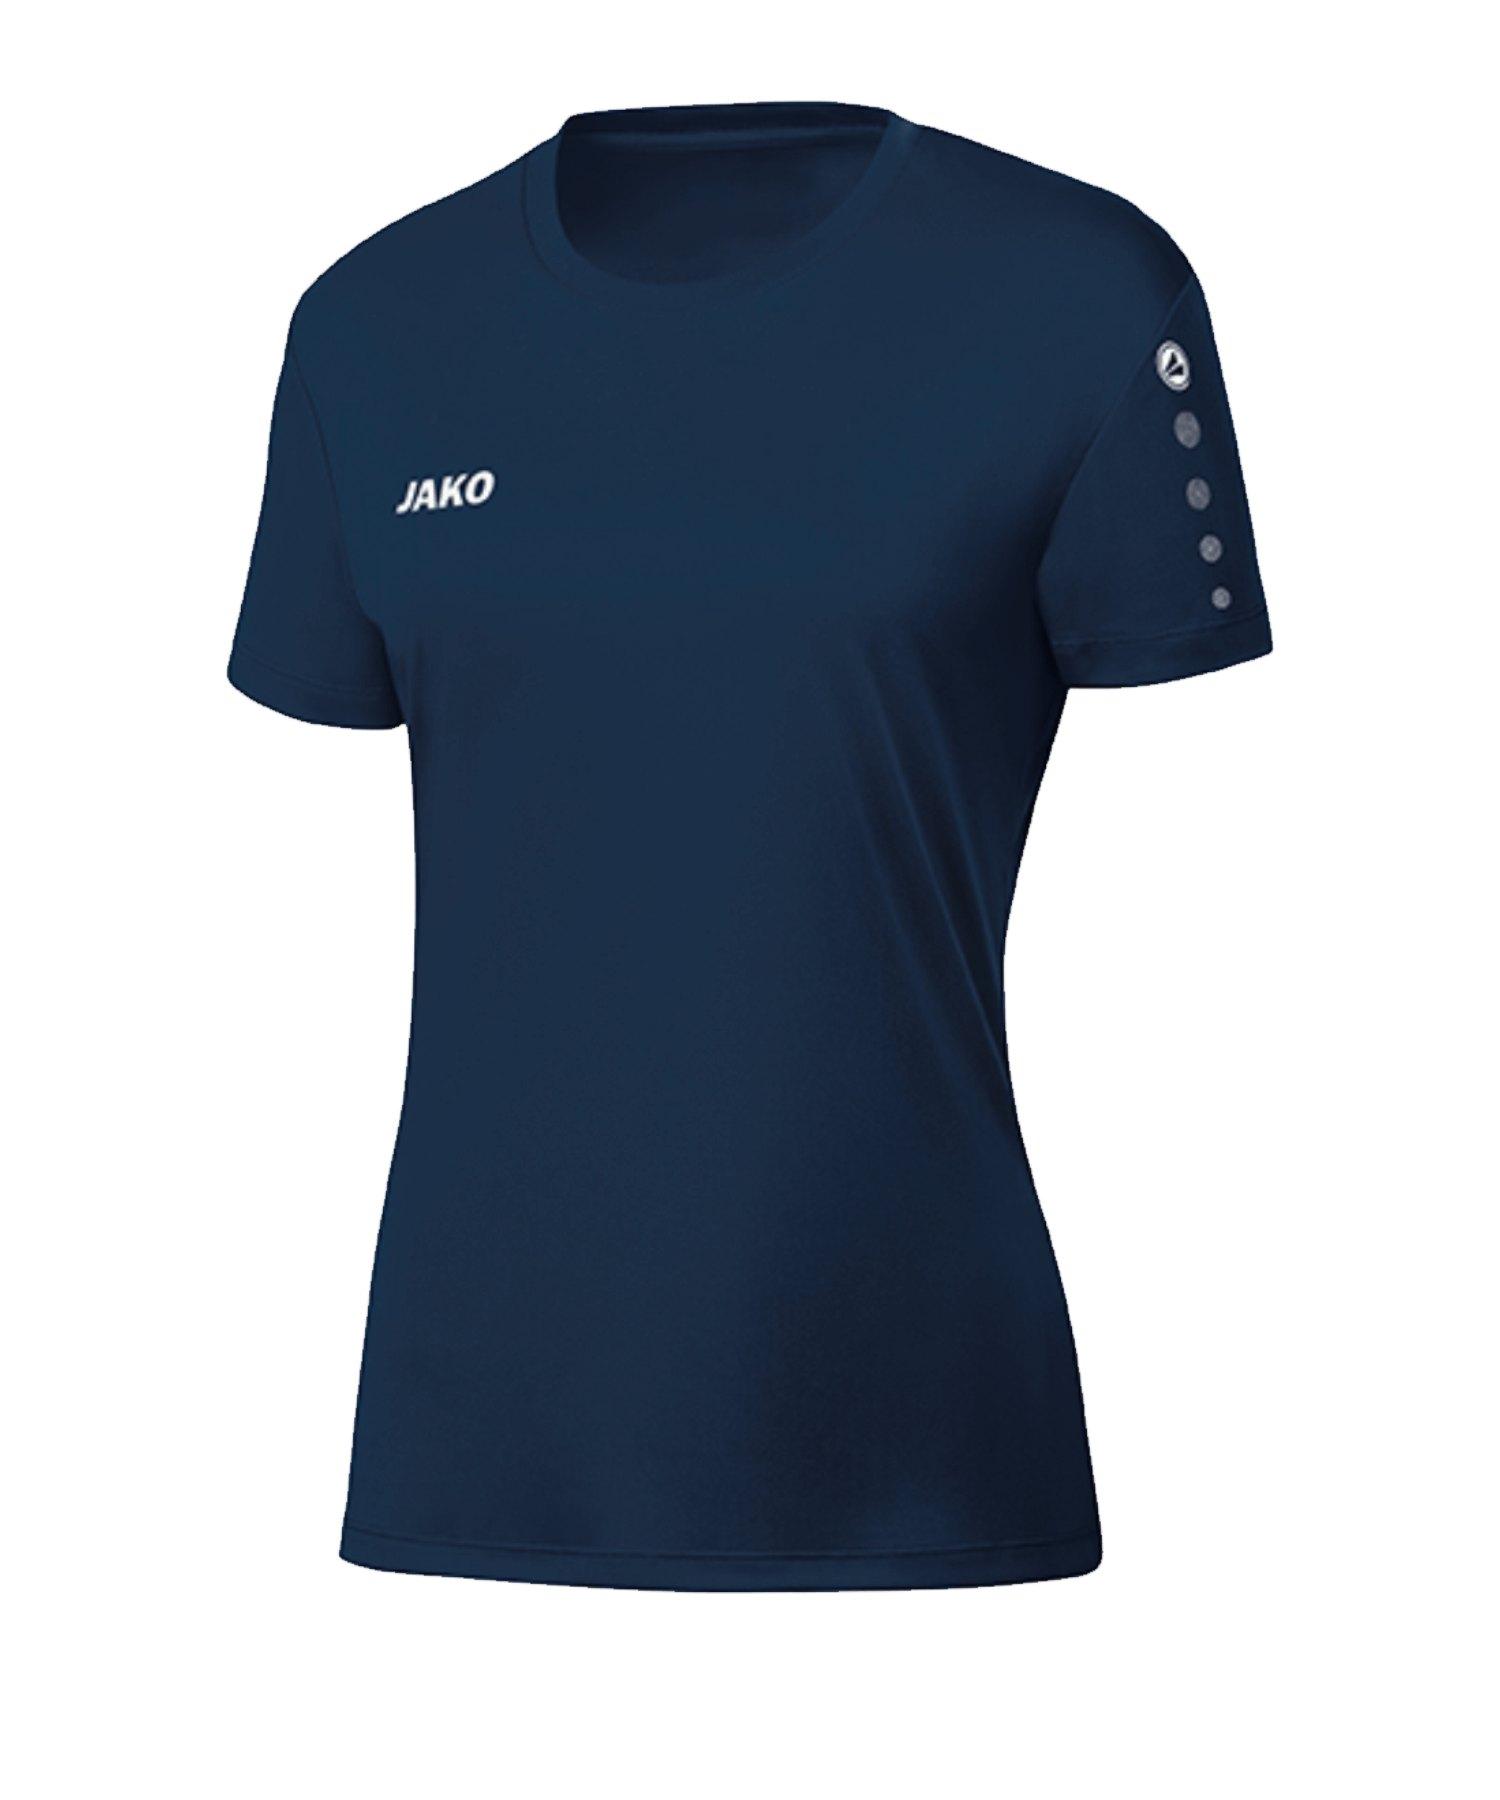 JAKO Team Trikot Damen Blau F09 - blau